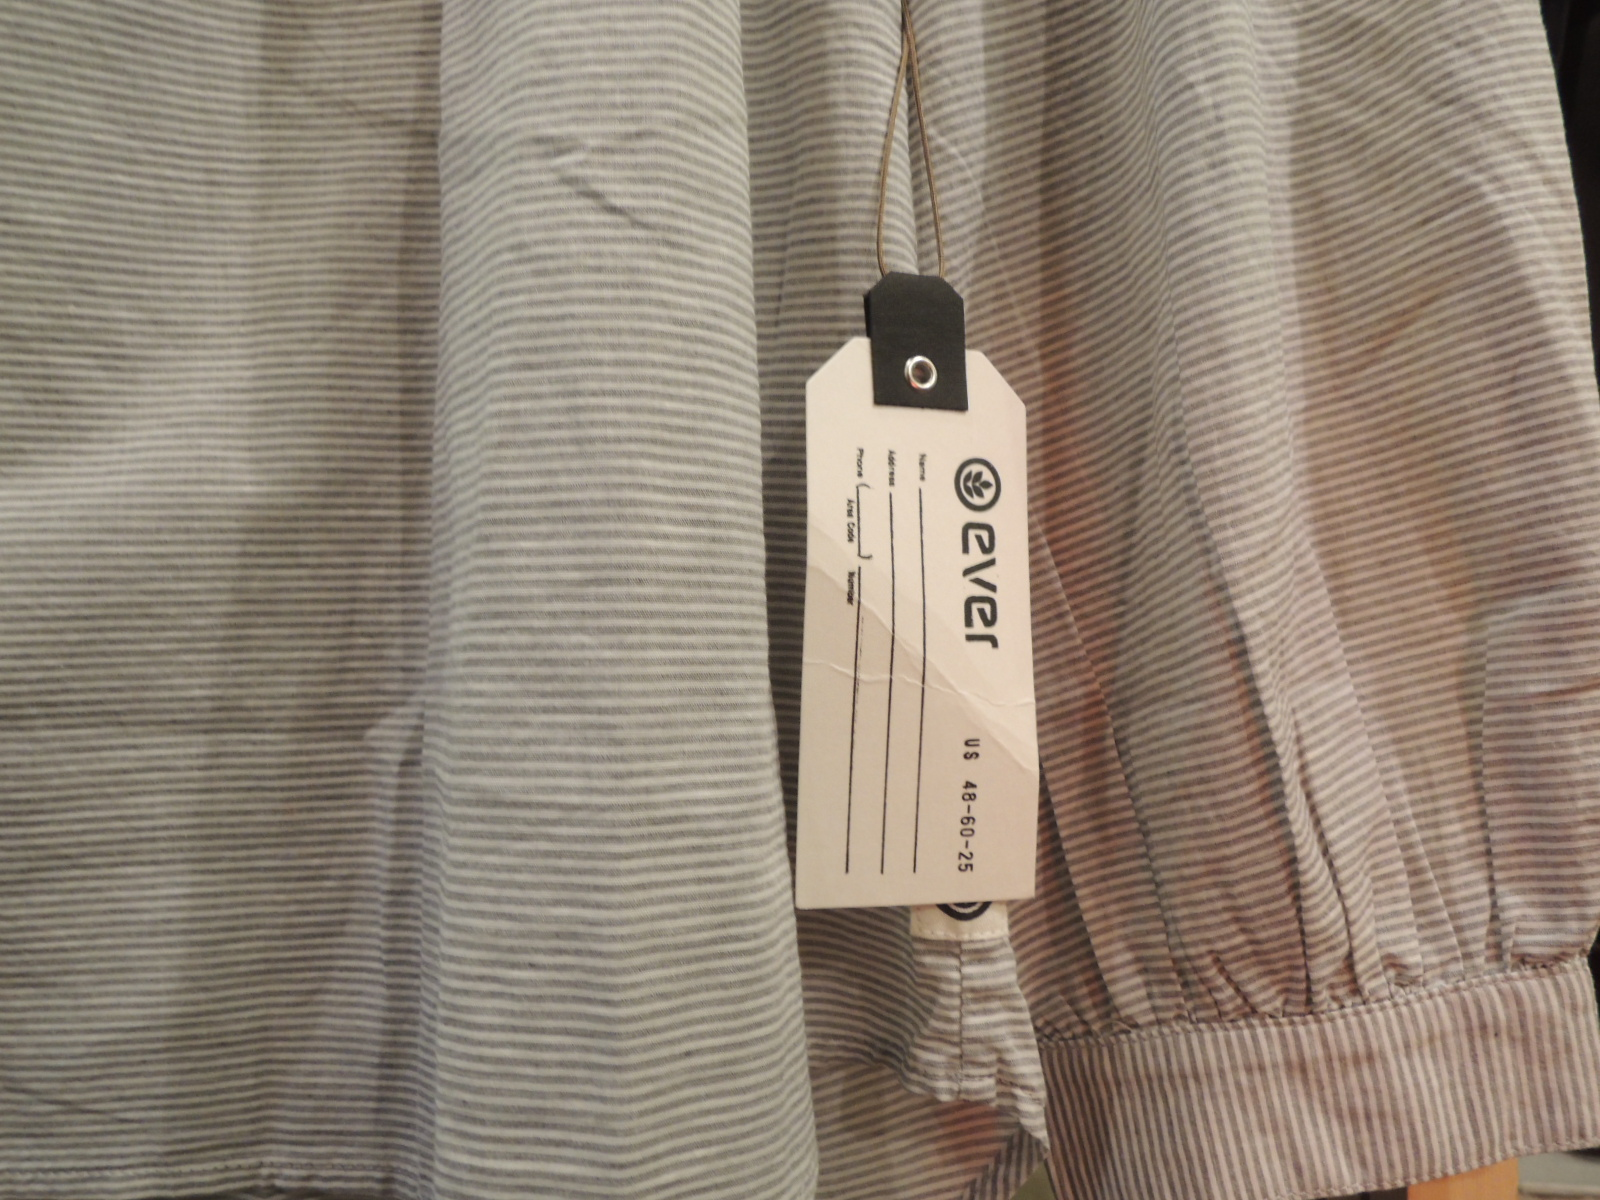 evershirts07.JPG